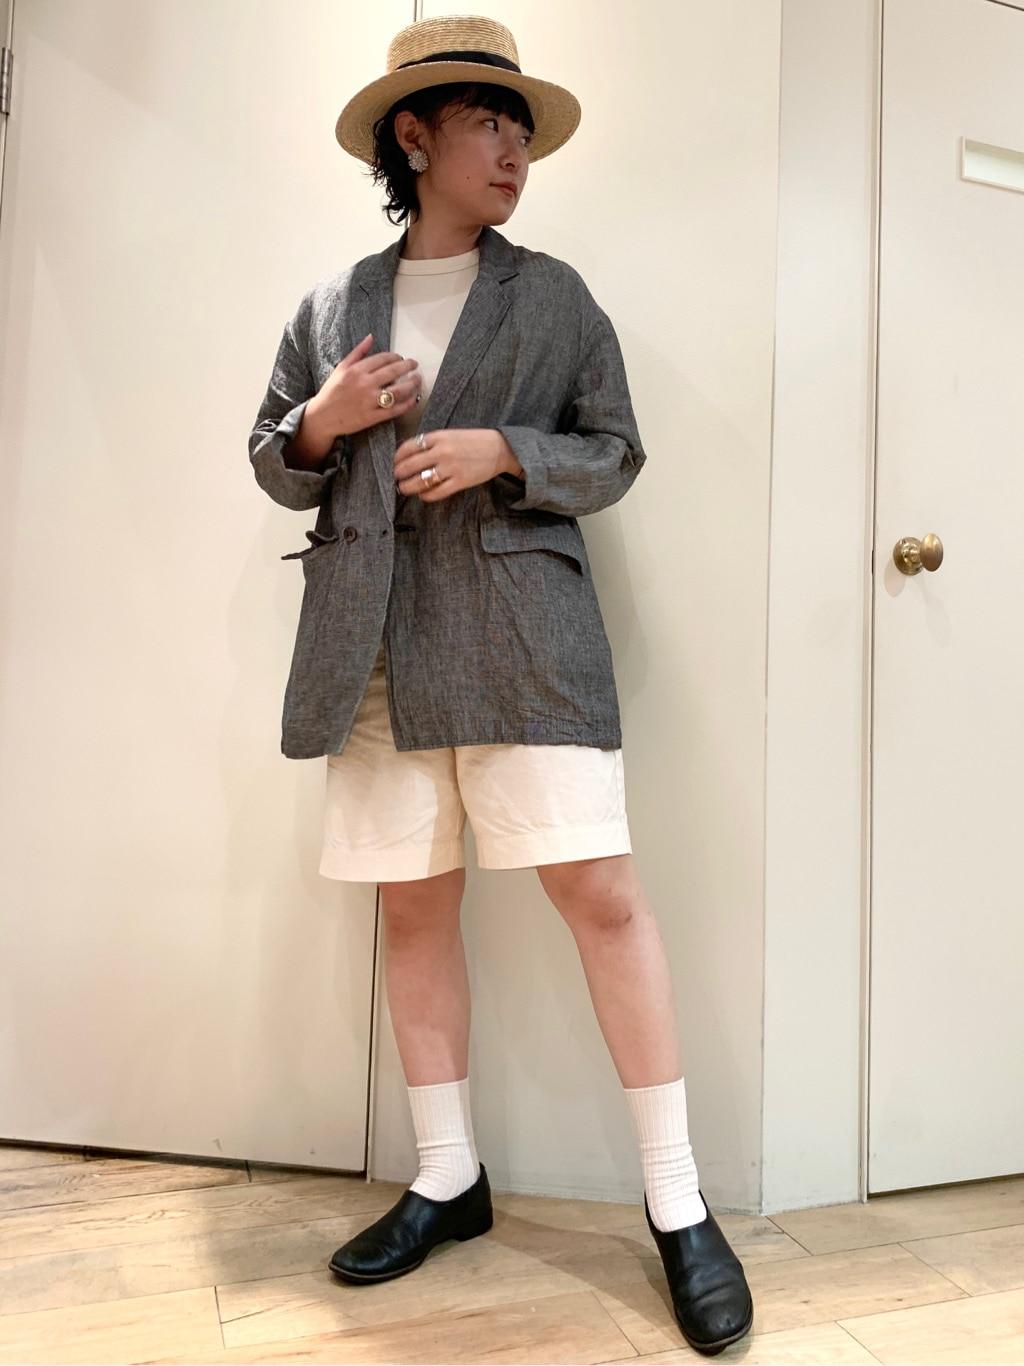 bulle de savon 新宿ミロード 身長:159cm 2020.06.11